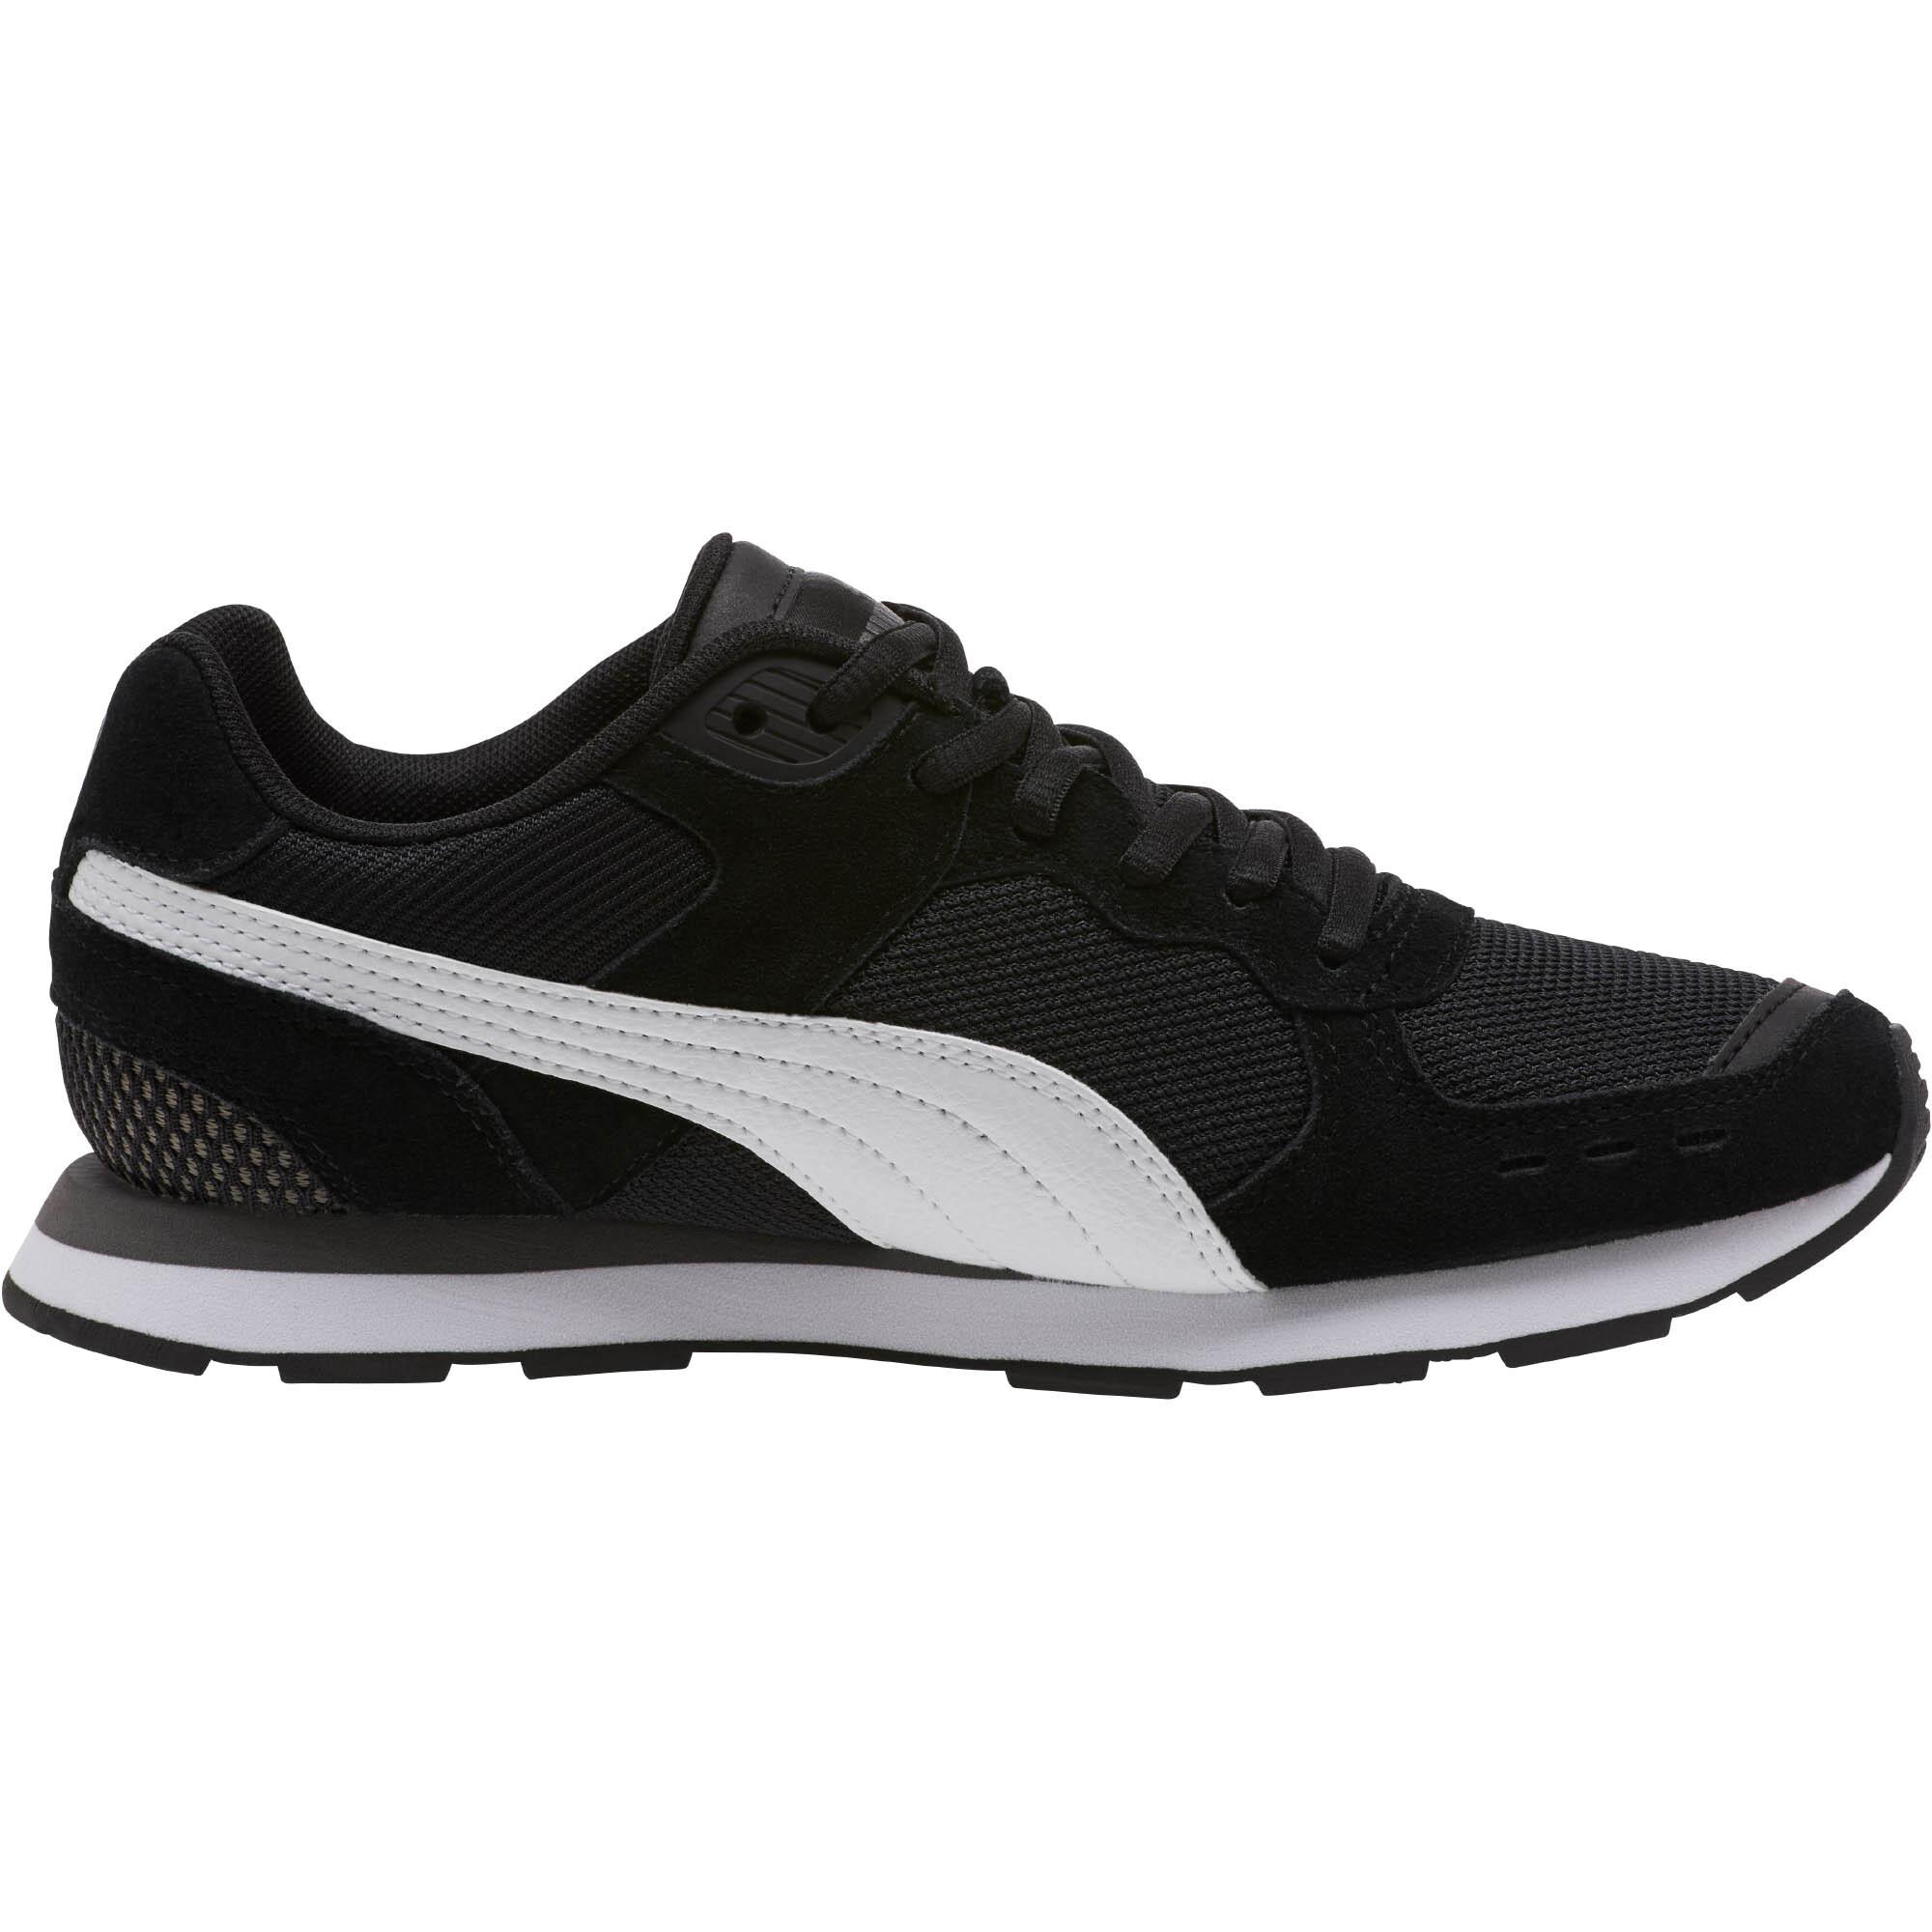 PUMA-Vista-Women-s-Sneakers-Women-Shoe-Basics thumbnail 5